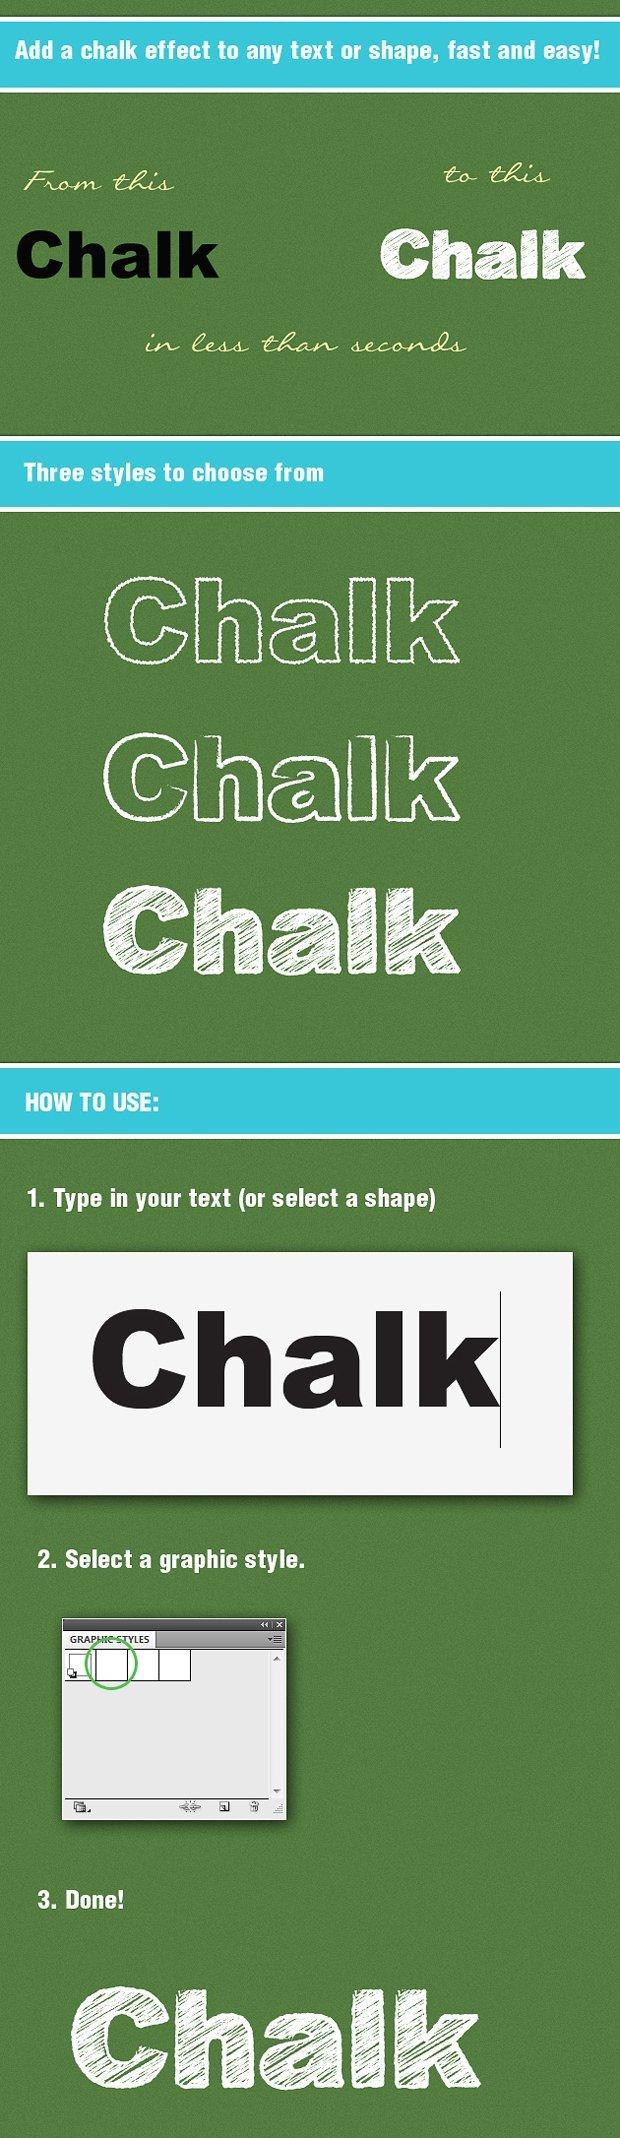 designtnt-chalk-graphic-style-large